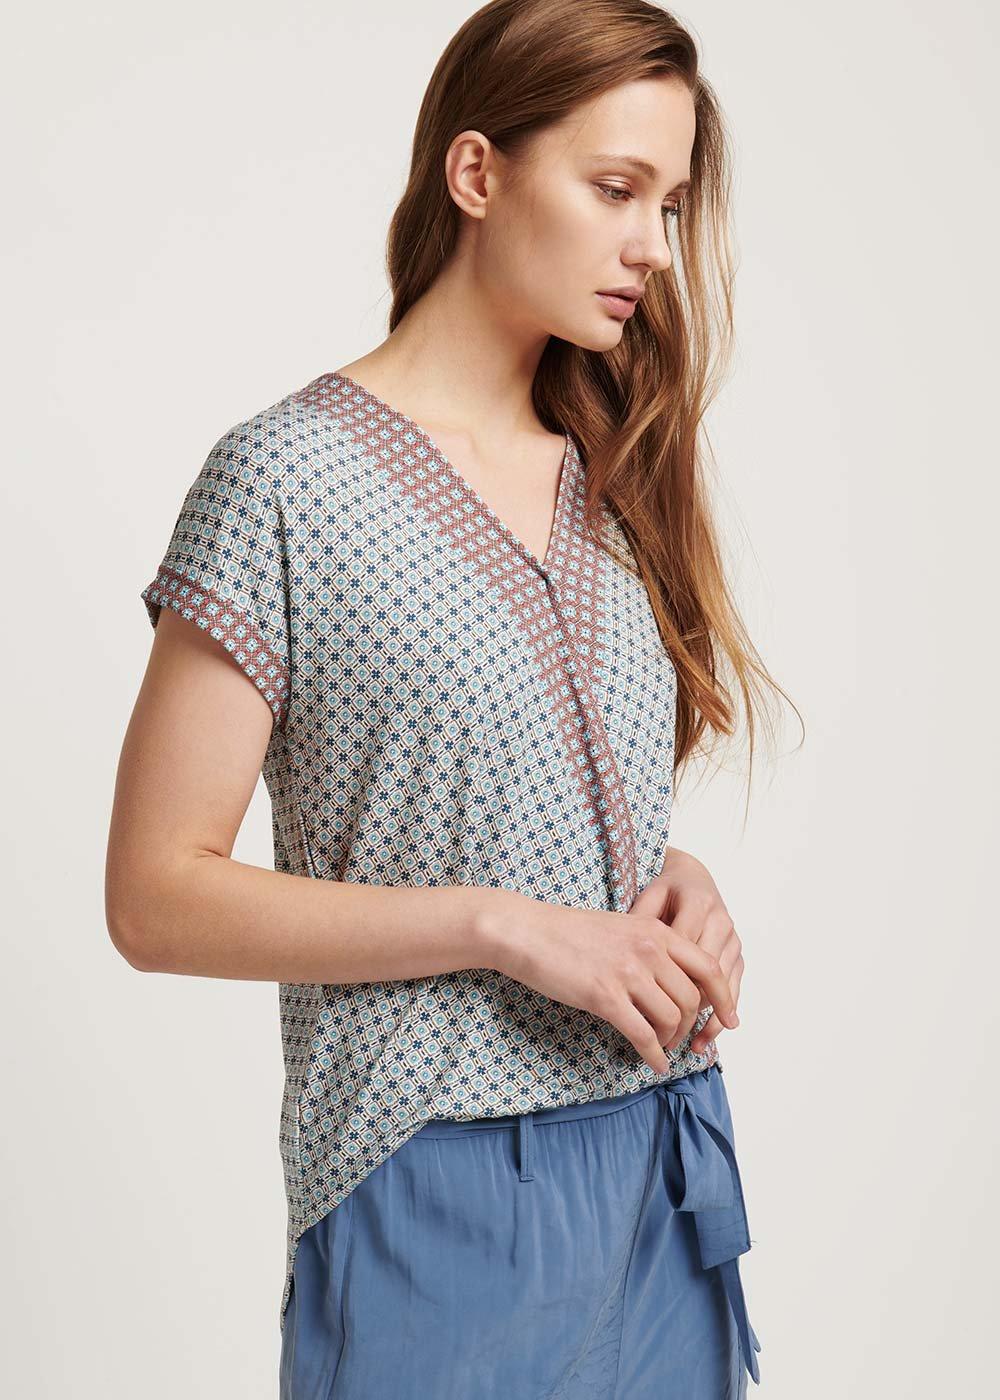 Sira patterned T-shirt with crisscross neck - Avion / Coccio / Fantasia - Woman